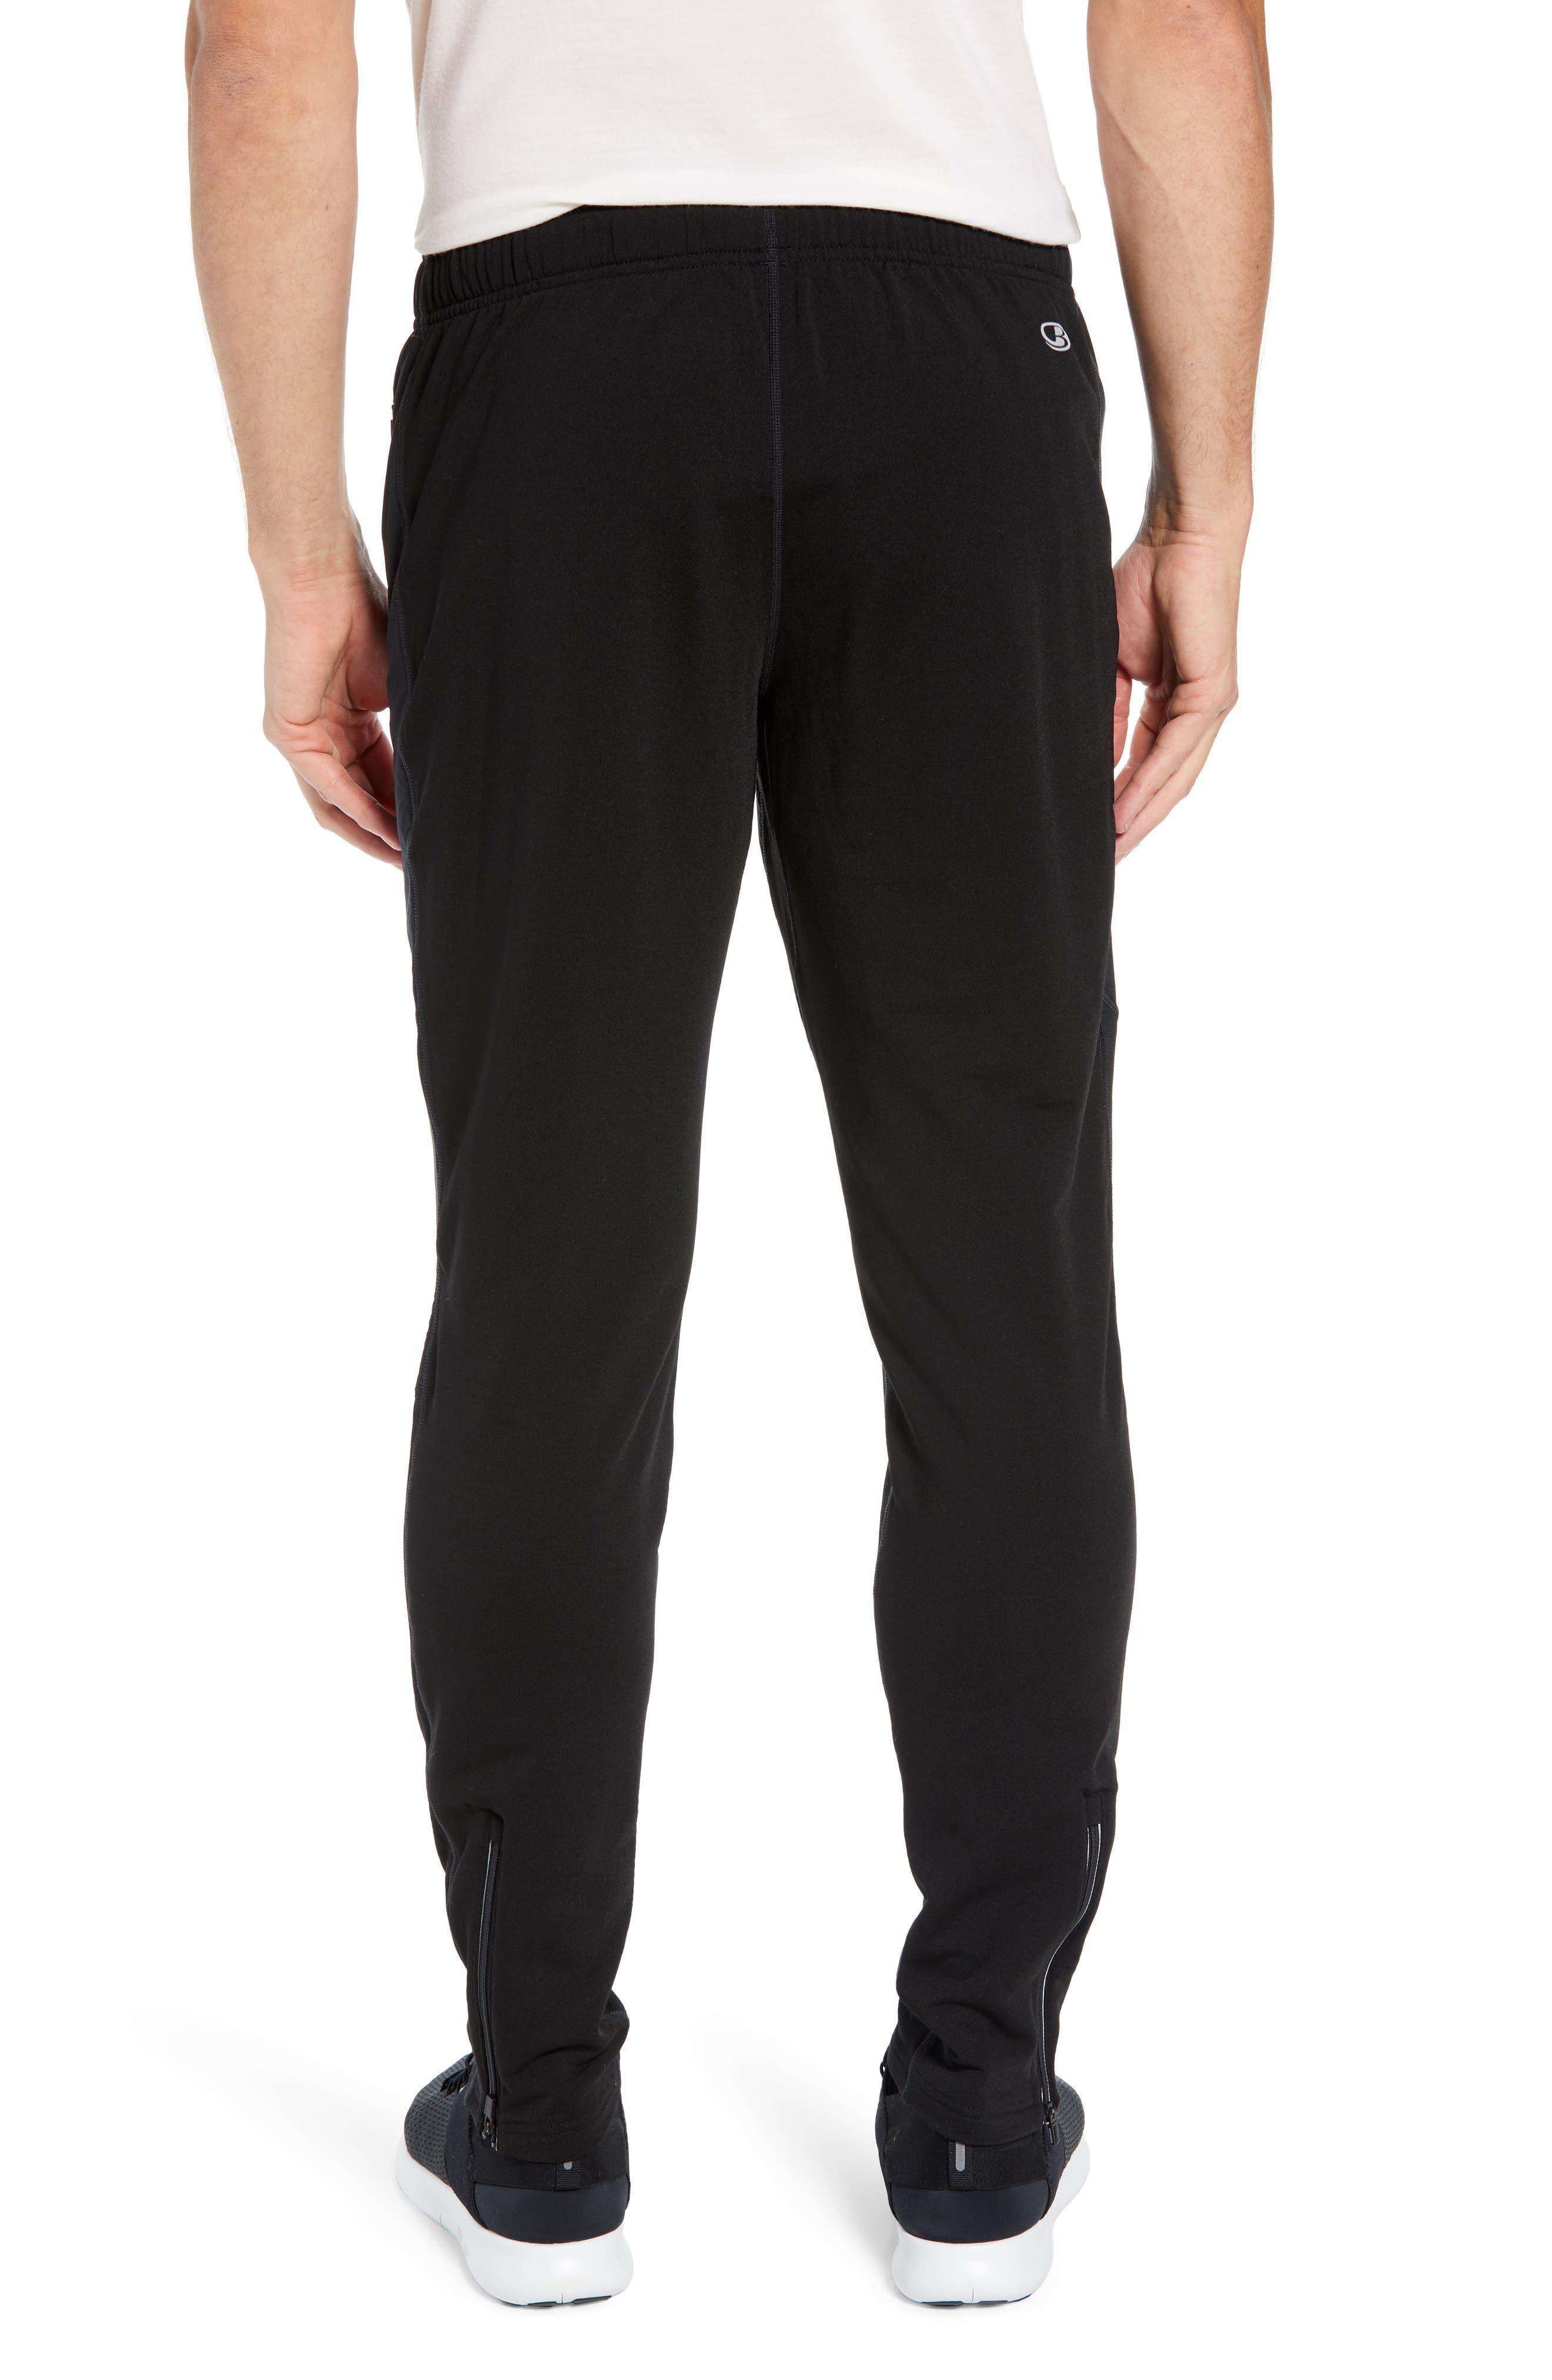 Tech Trainer Hybrid Sport Pants,                             Alternate thumbnail 2, color,                             BLACK